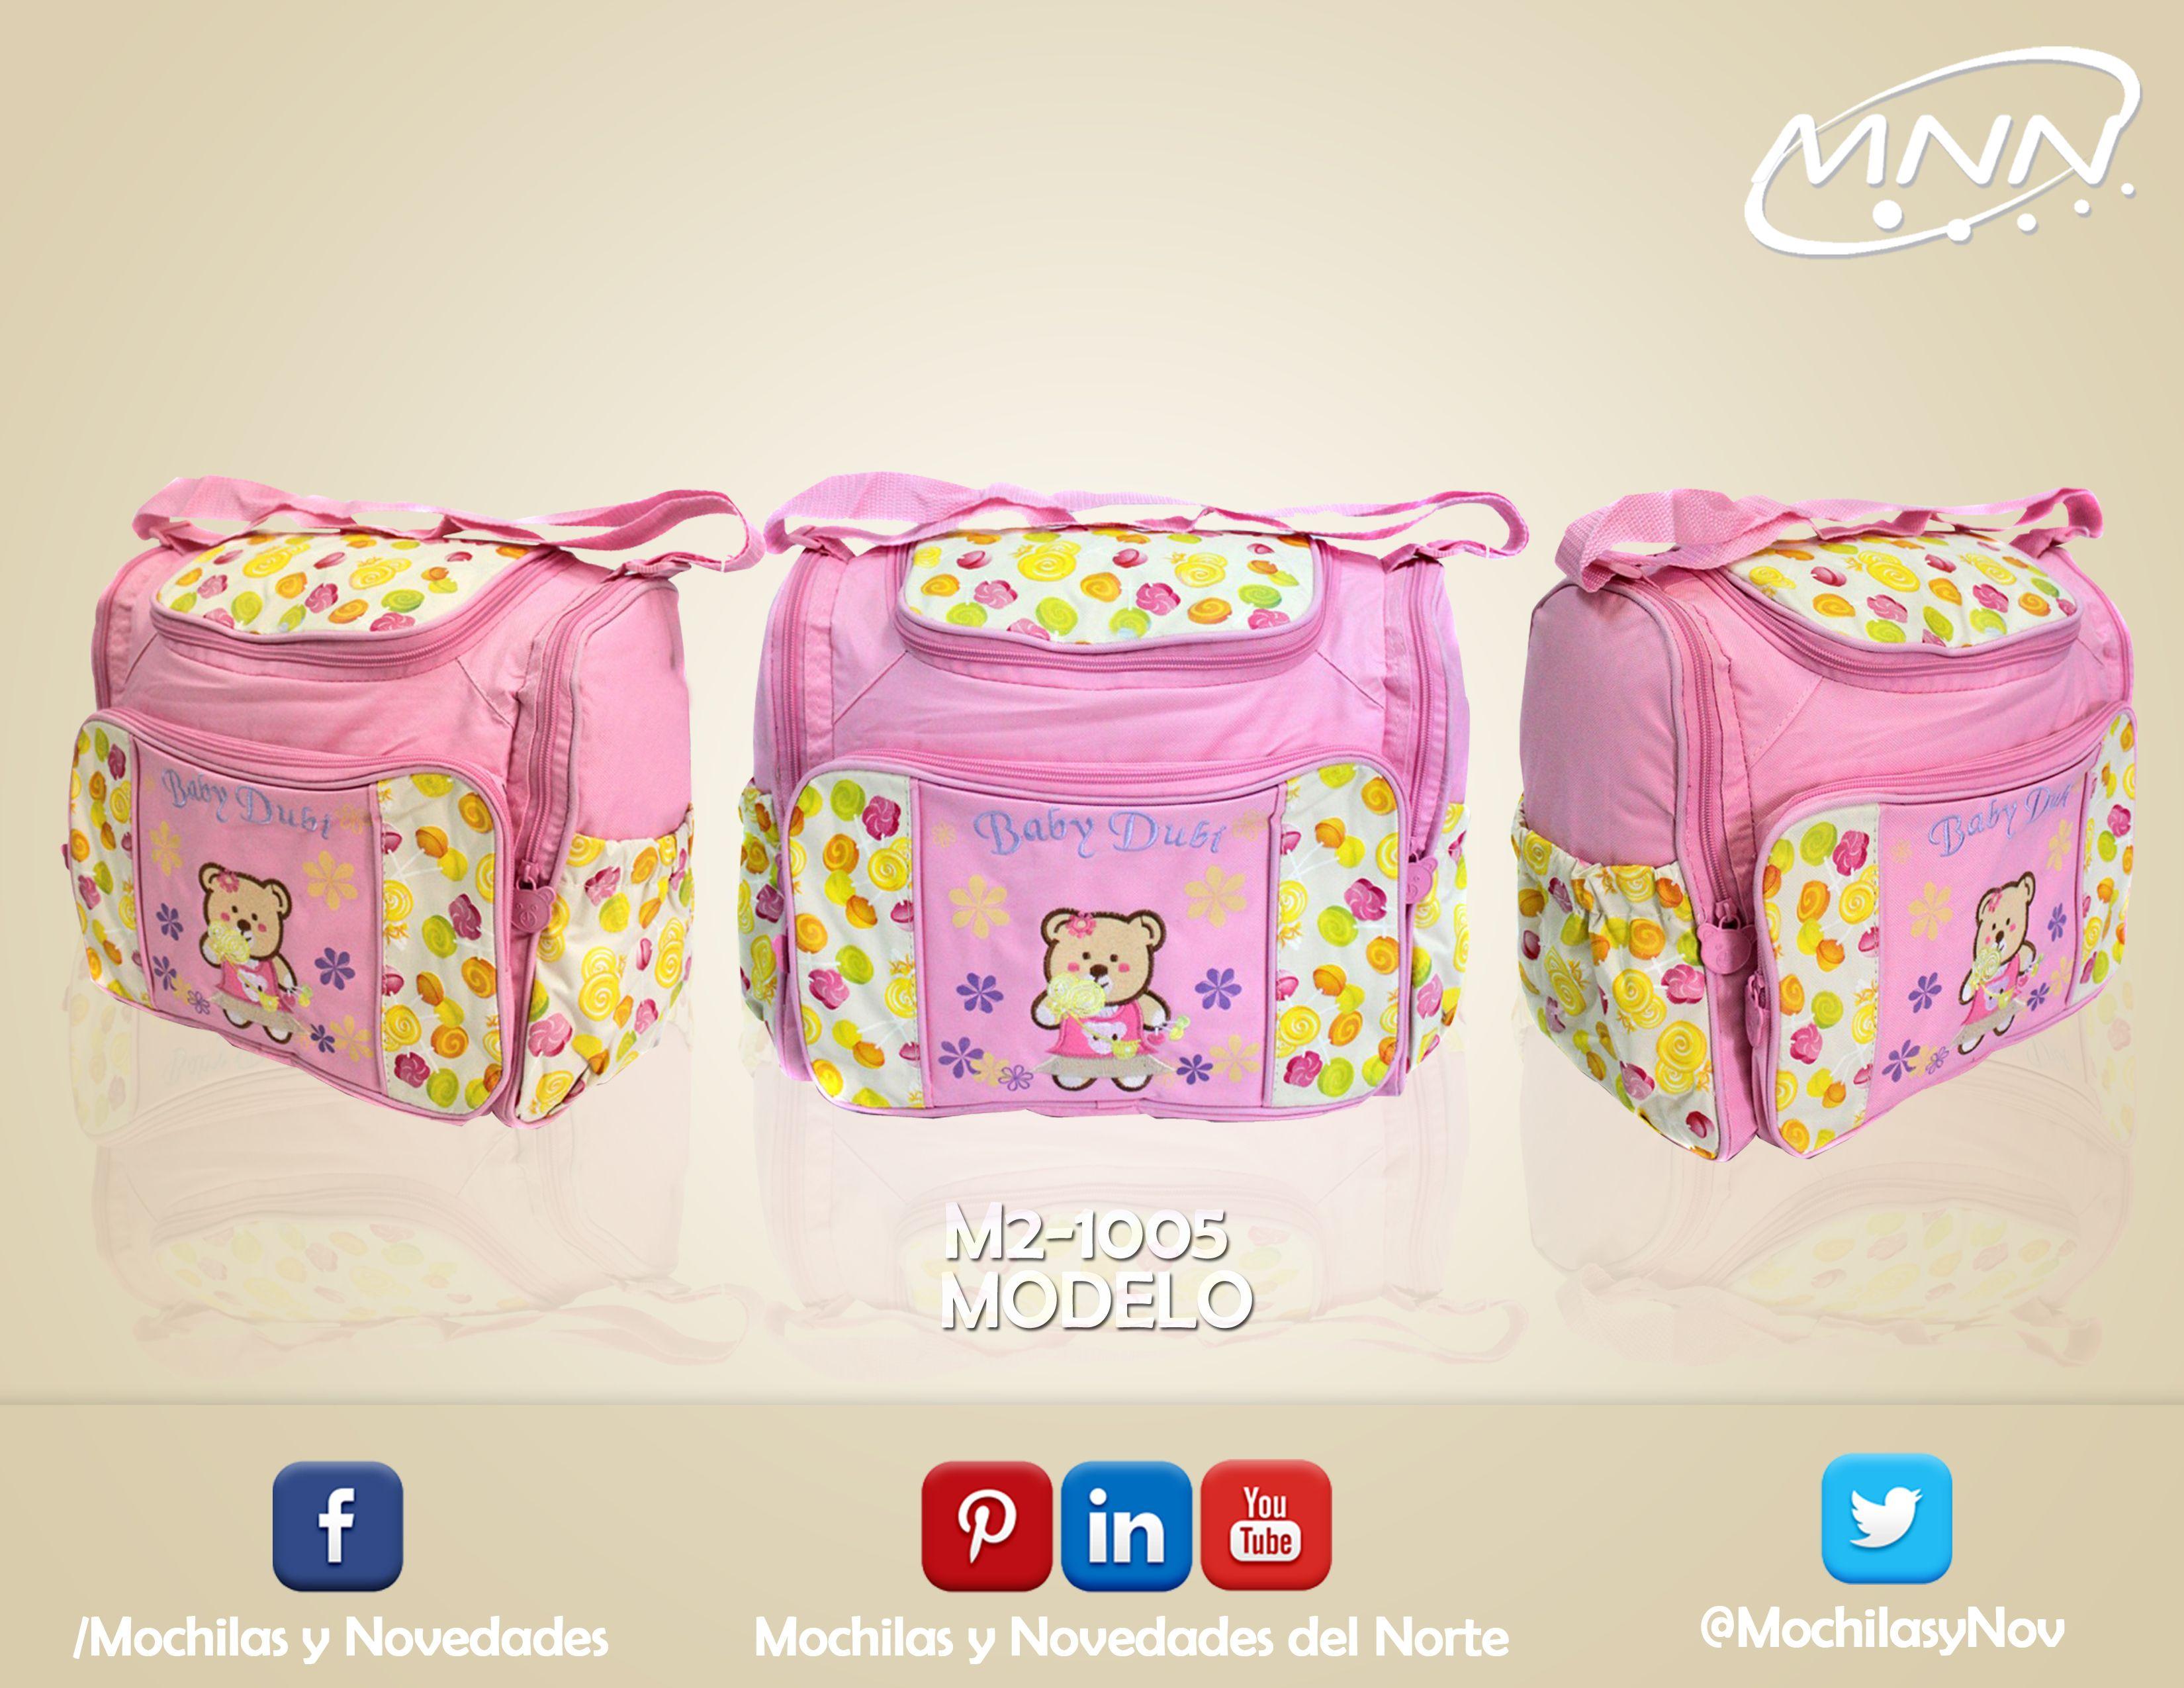 Super Bonita Pañalera de Baby Dubi http://www.mnn.com.mx/product.php?id_product=419